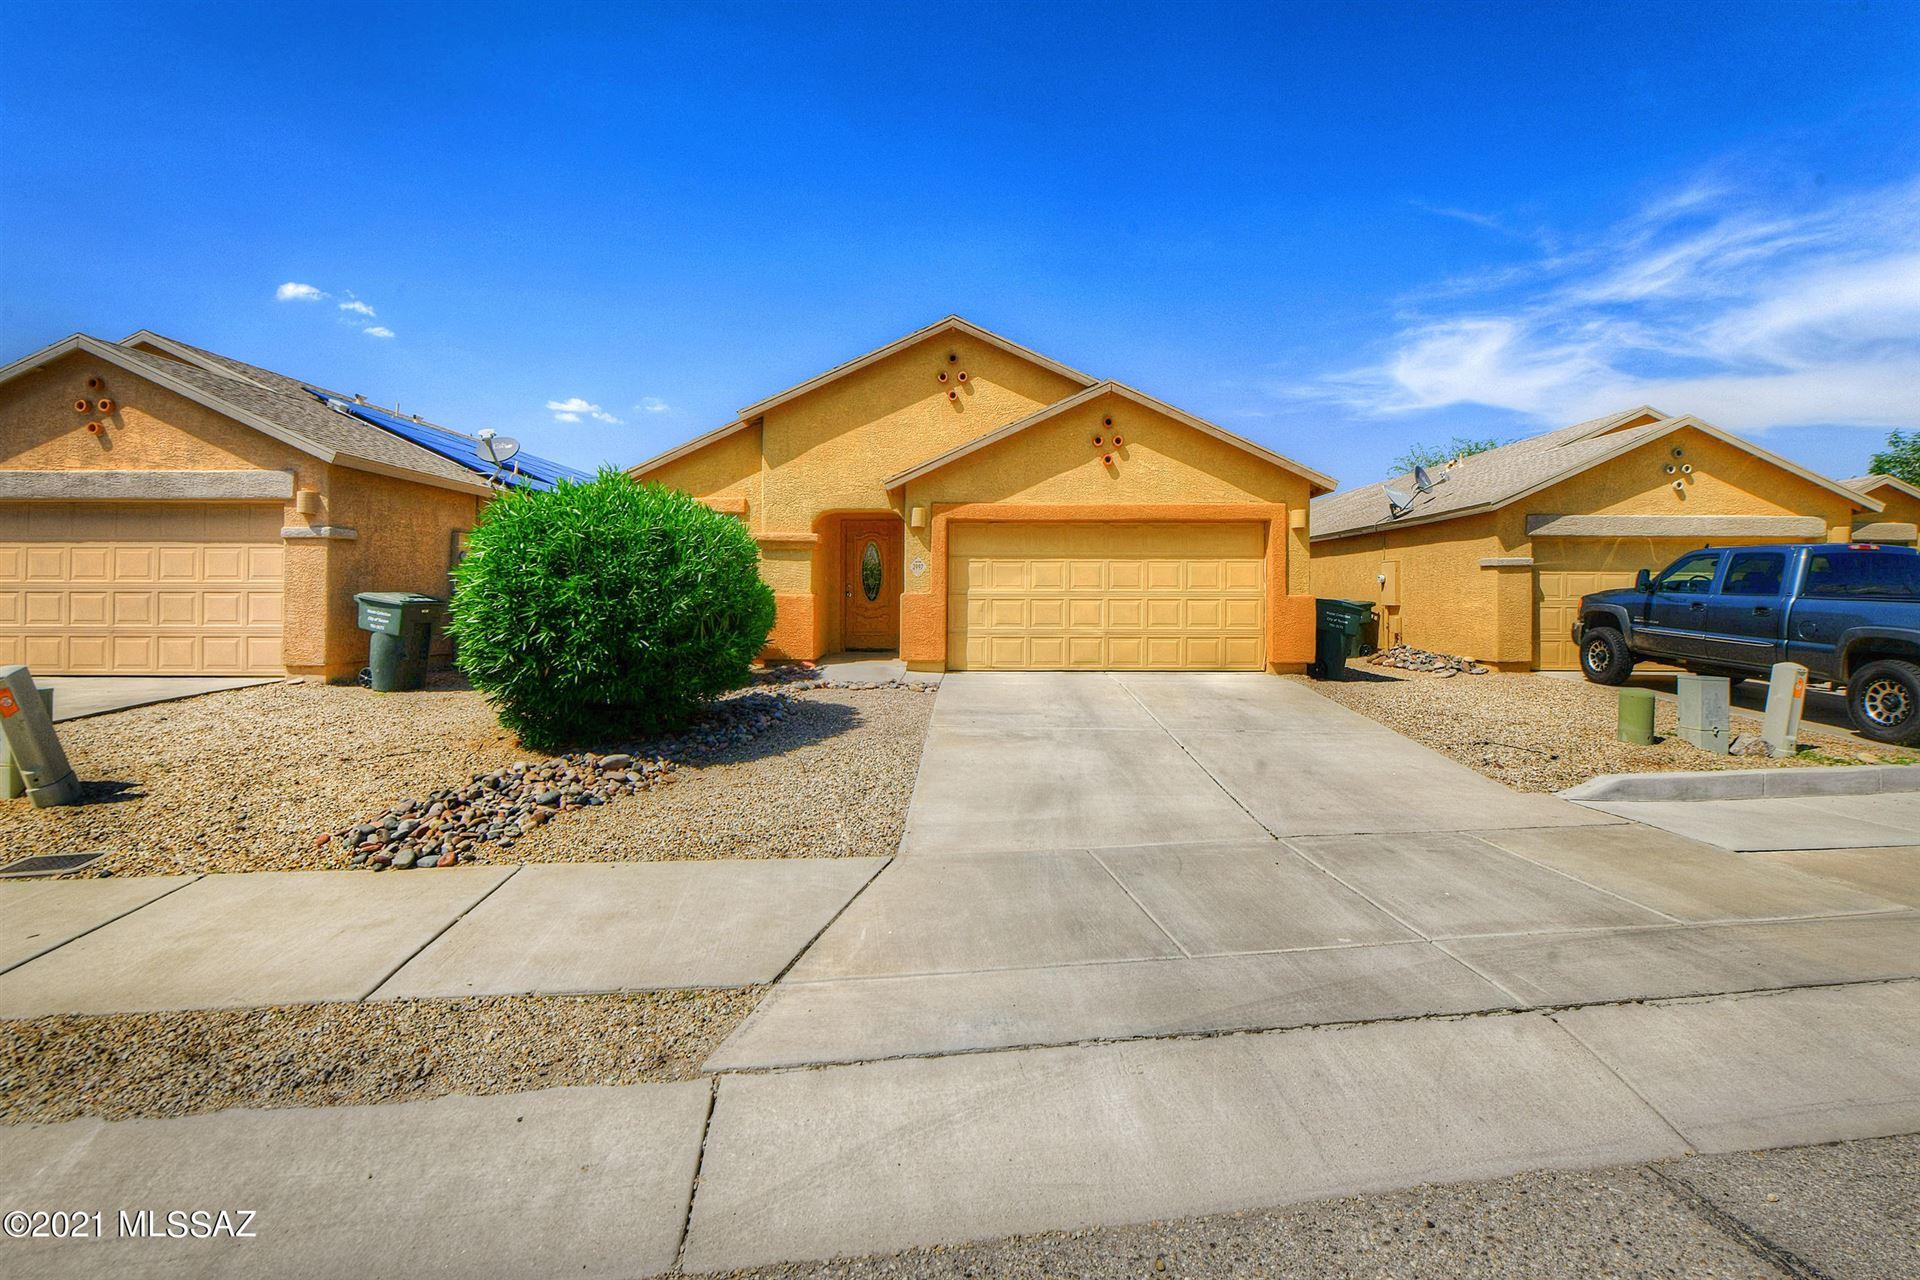 3997 E Isaiah Drive, Tucson, AZ 85706 - MLS#: 22120026